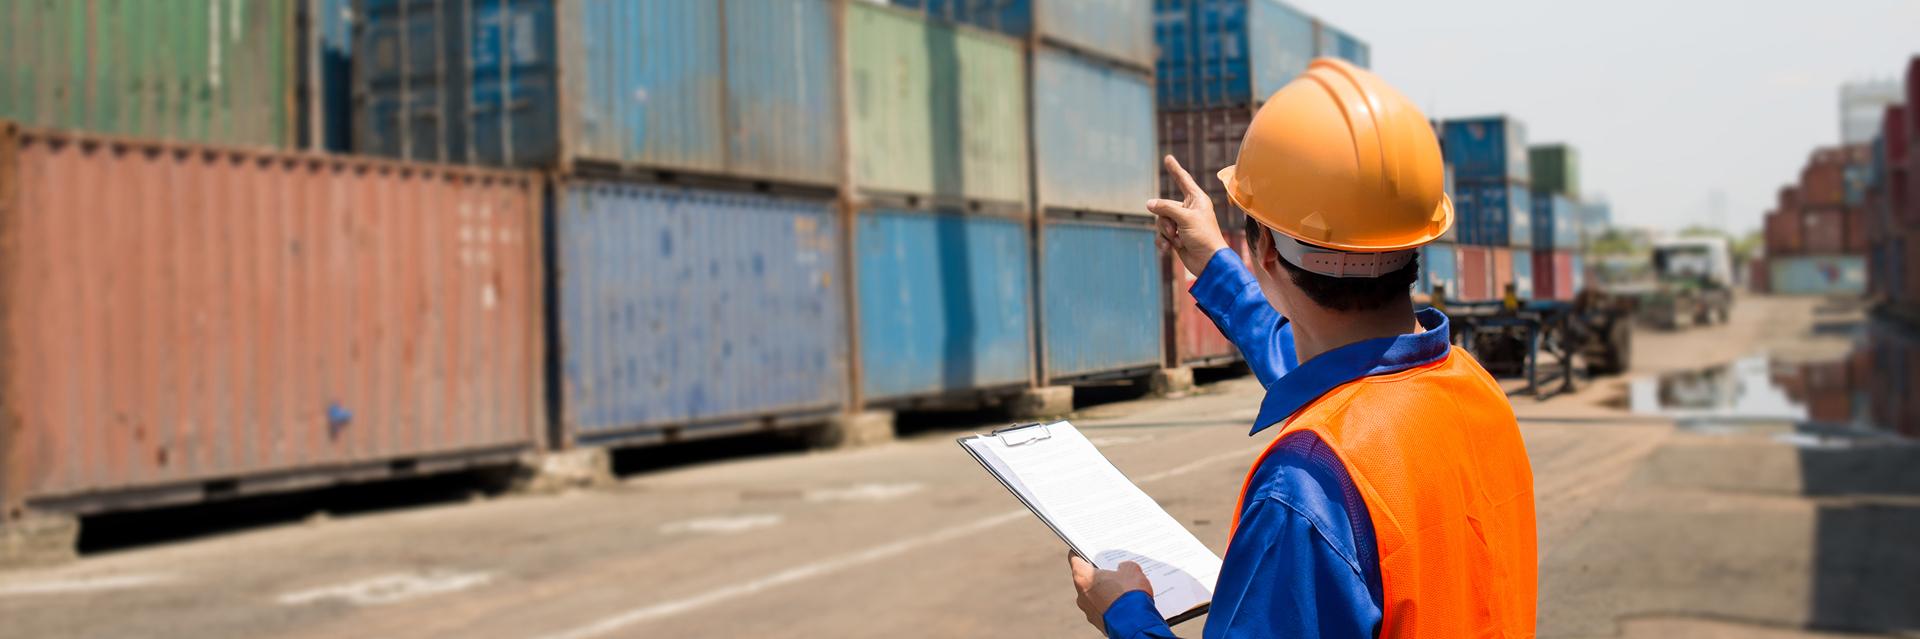 Workers-Comp-Longshoreman